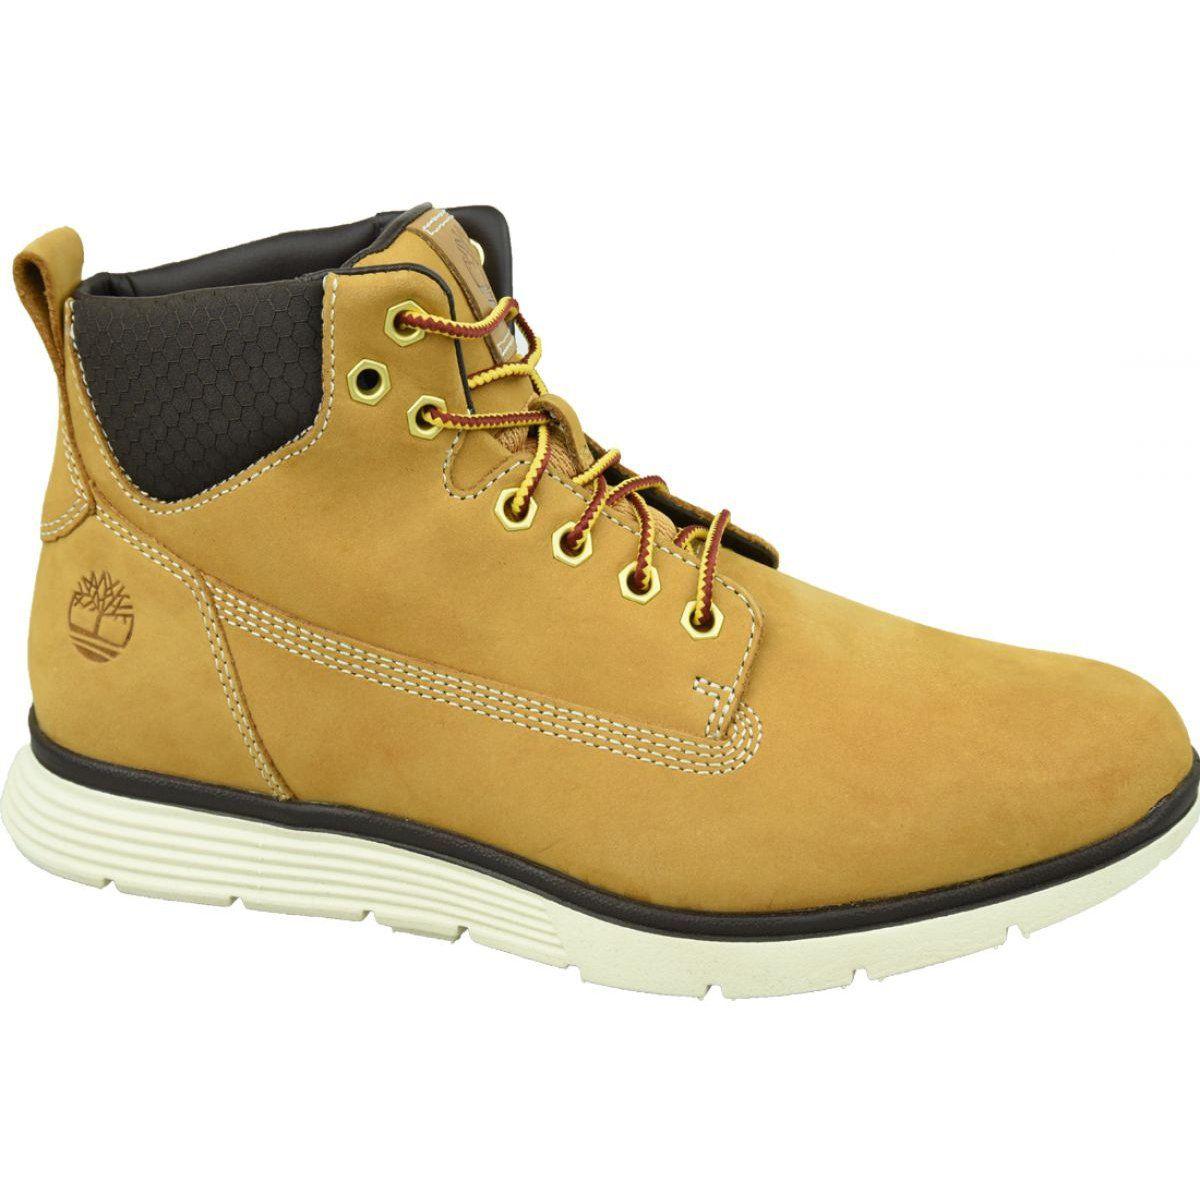 Buty Timberland Killington Chukka M A191i Zolte Popular Shoes Killington Chukka Sport Shoes Men